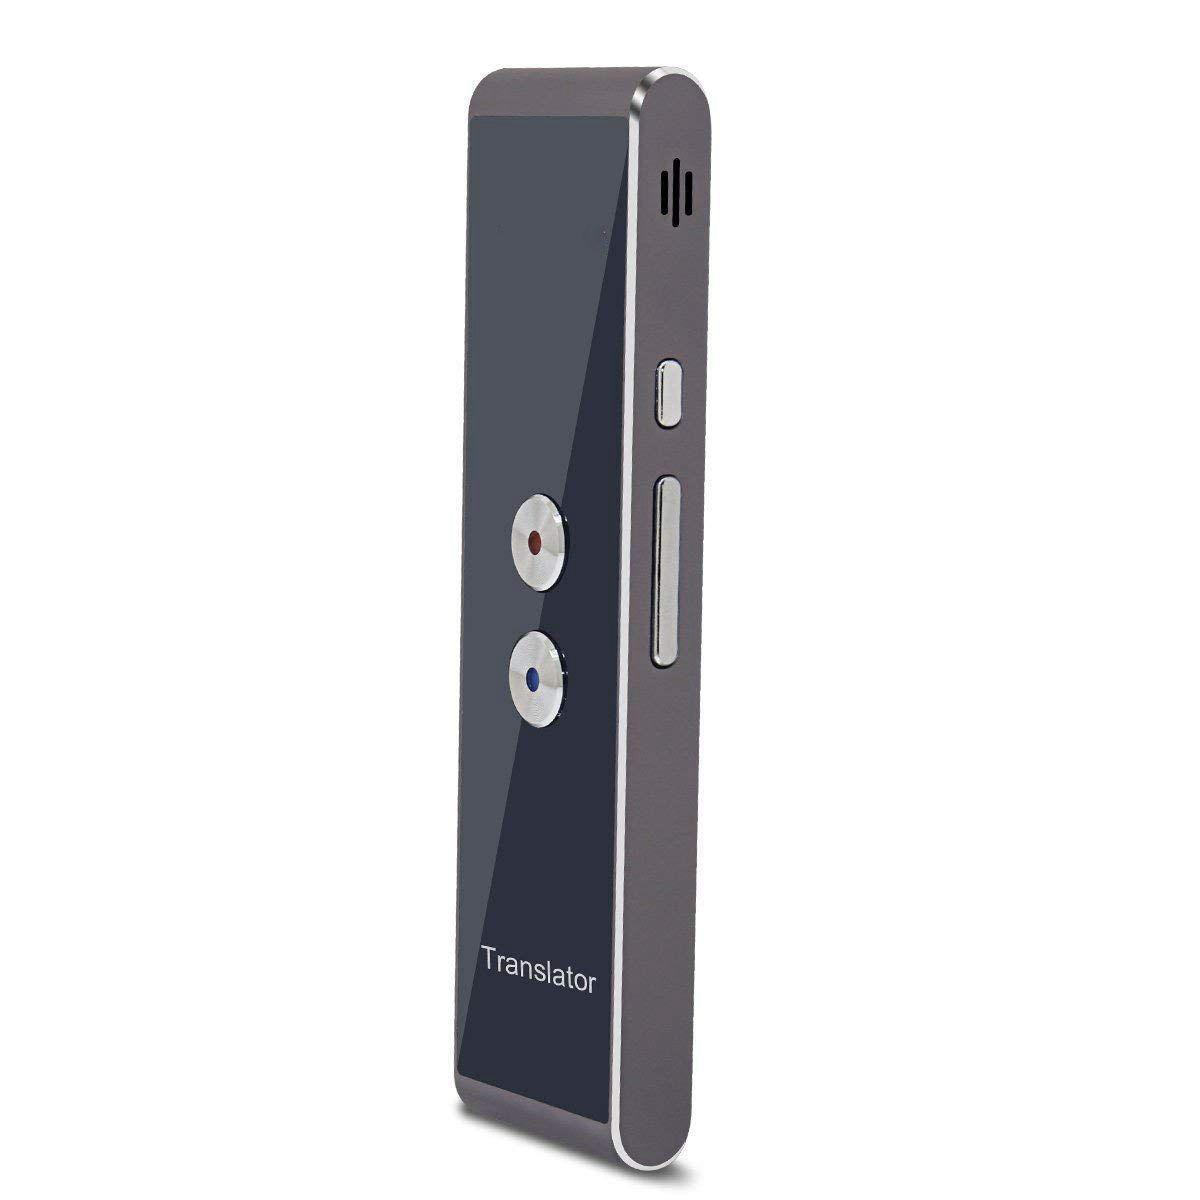 T8 Handheld Pocket Smart Voice Translator Real Time Speech Translation, 30+ Languages For Travel Business Shopping Meeting Translator By Ertic.